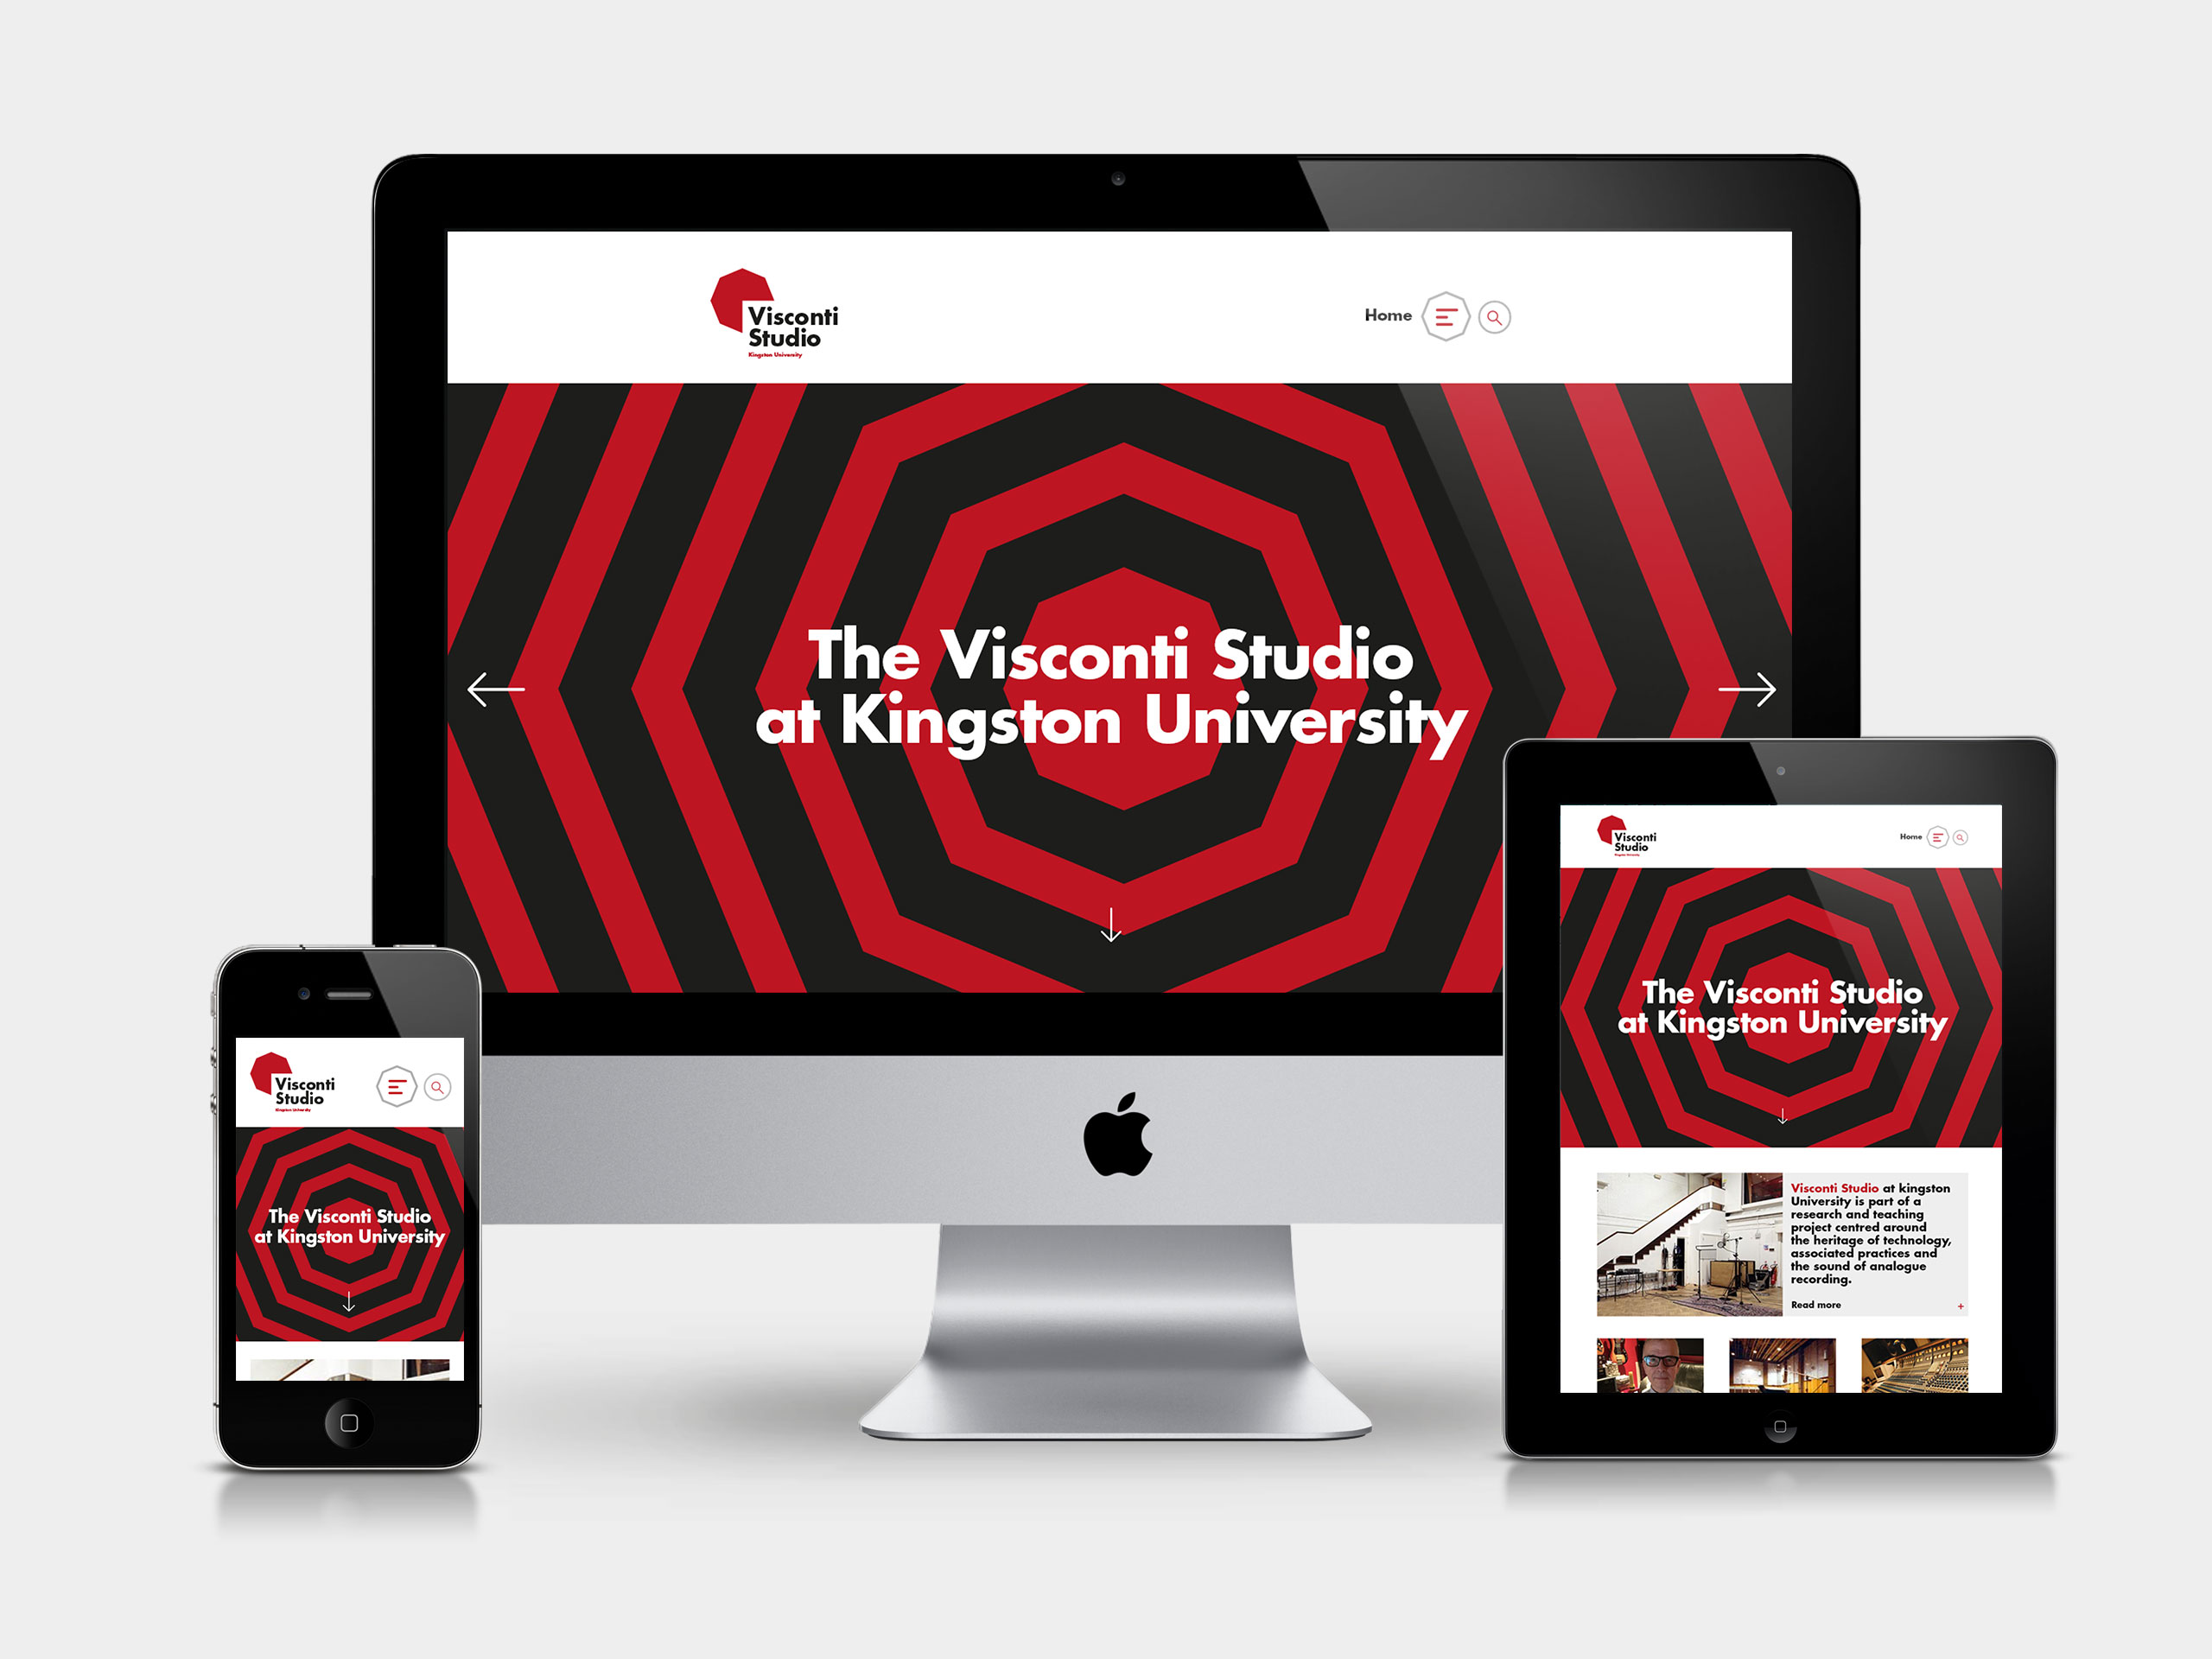 Visconti_Kingston_University_Website_Adapt_image1